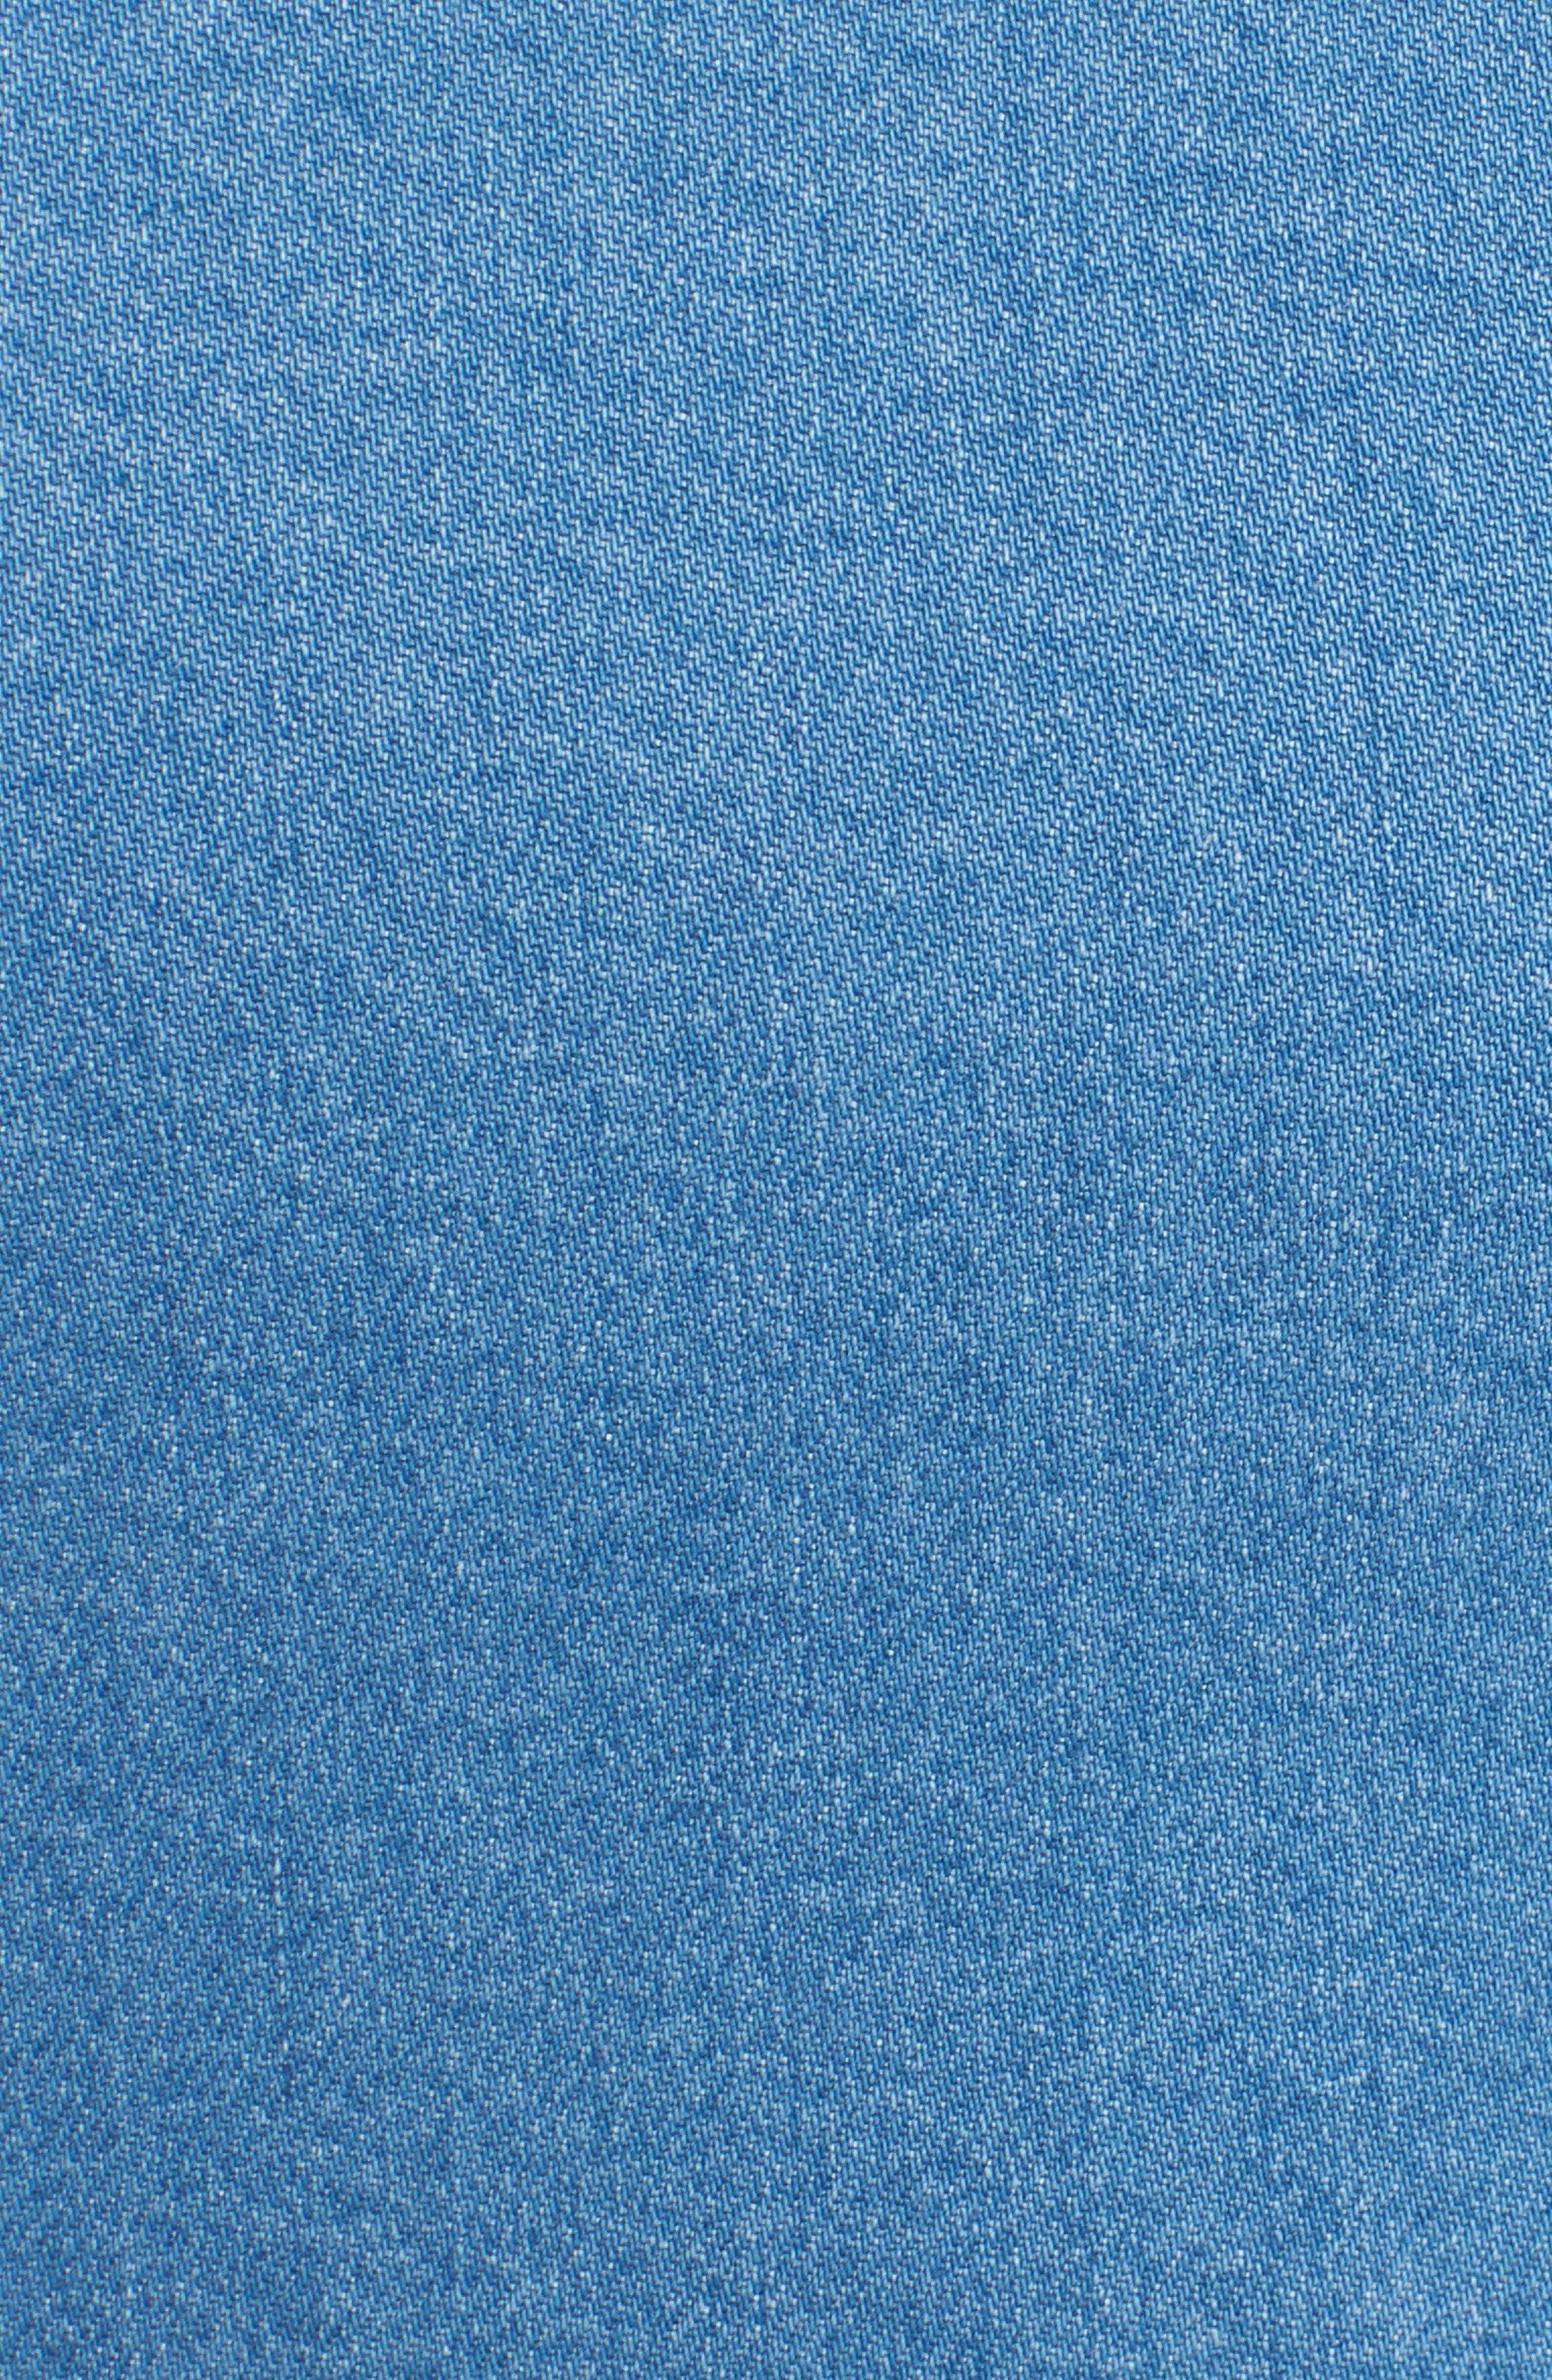 Long Sleeve Denim Dress,                             Alternate thumbnail 5, color,                             491